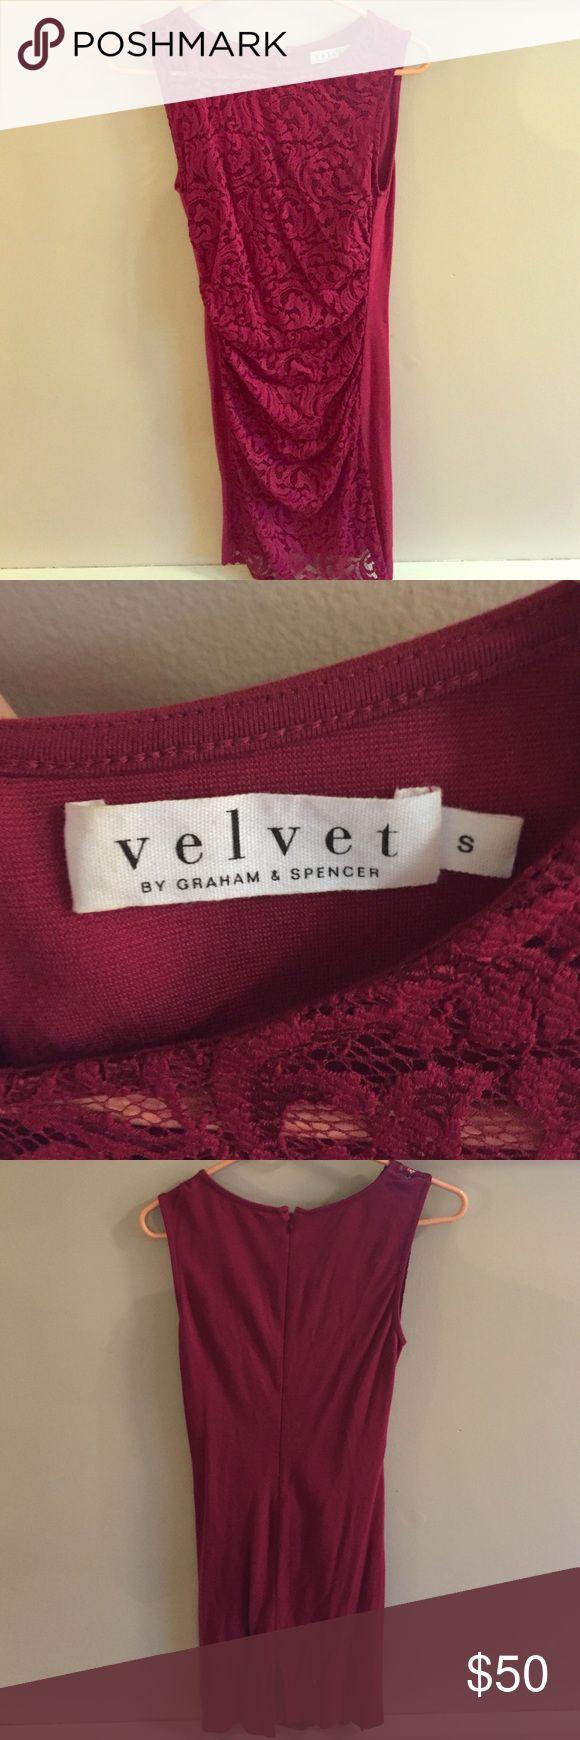 Velvet Graham & Spencer Izzy Stretch Lace Dress Worn only once Velvet by Graham & Spencer Izzy stretch Lace dress - perfect cocktail party dress Velvet Dresses